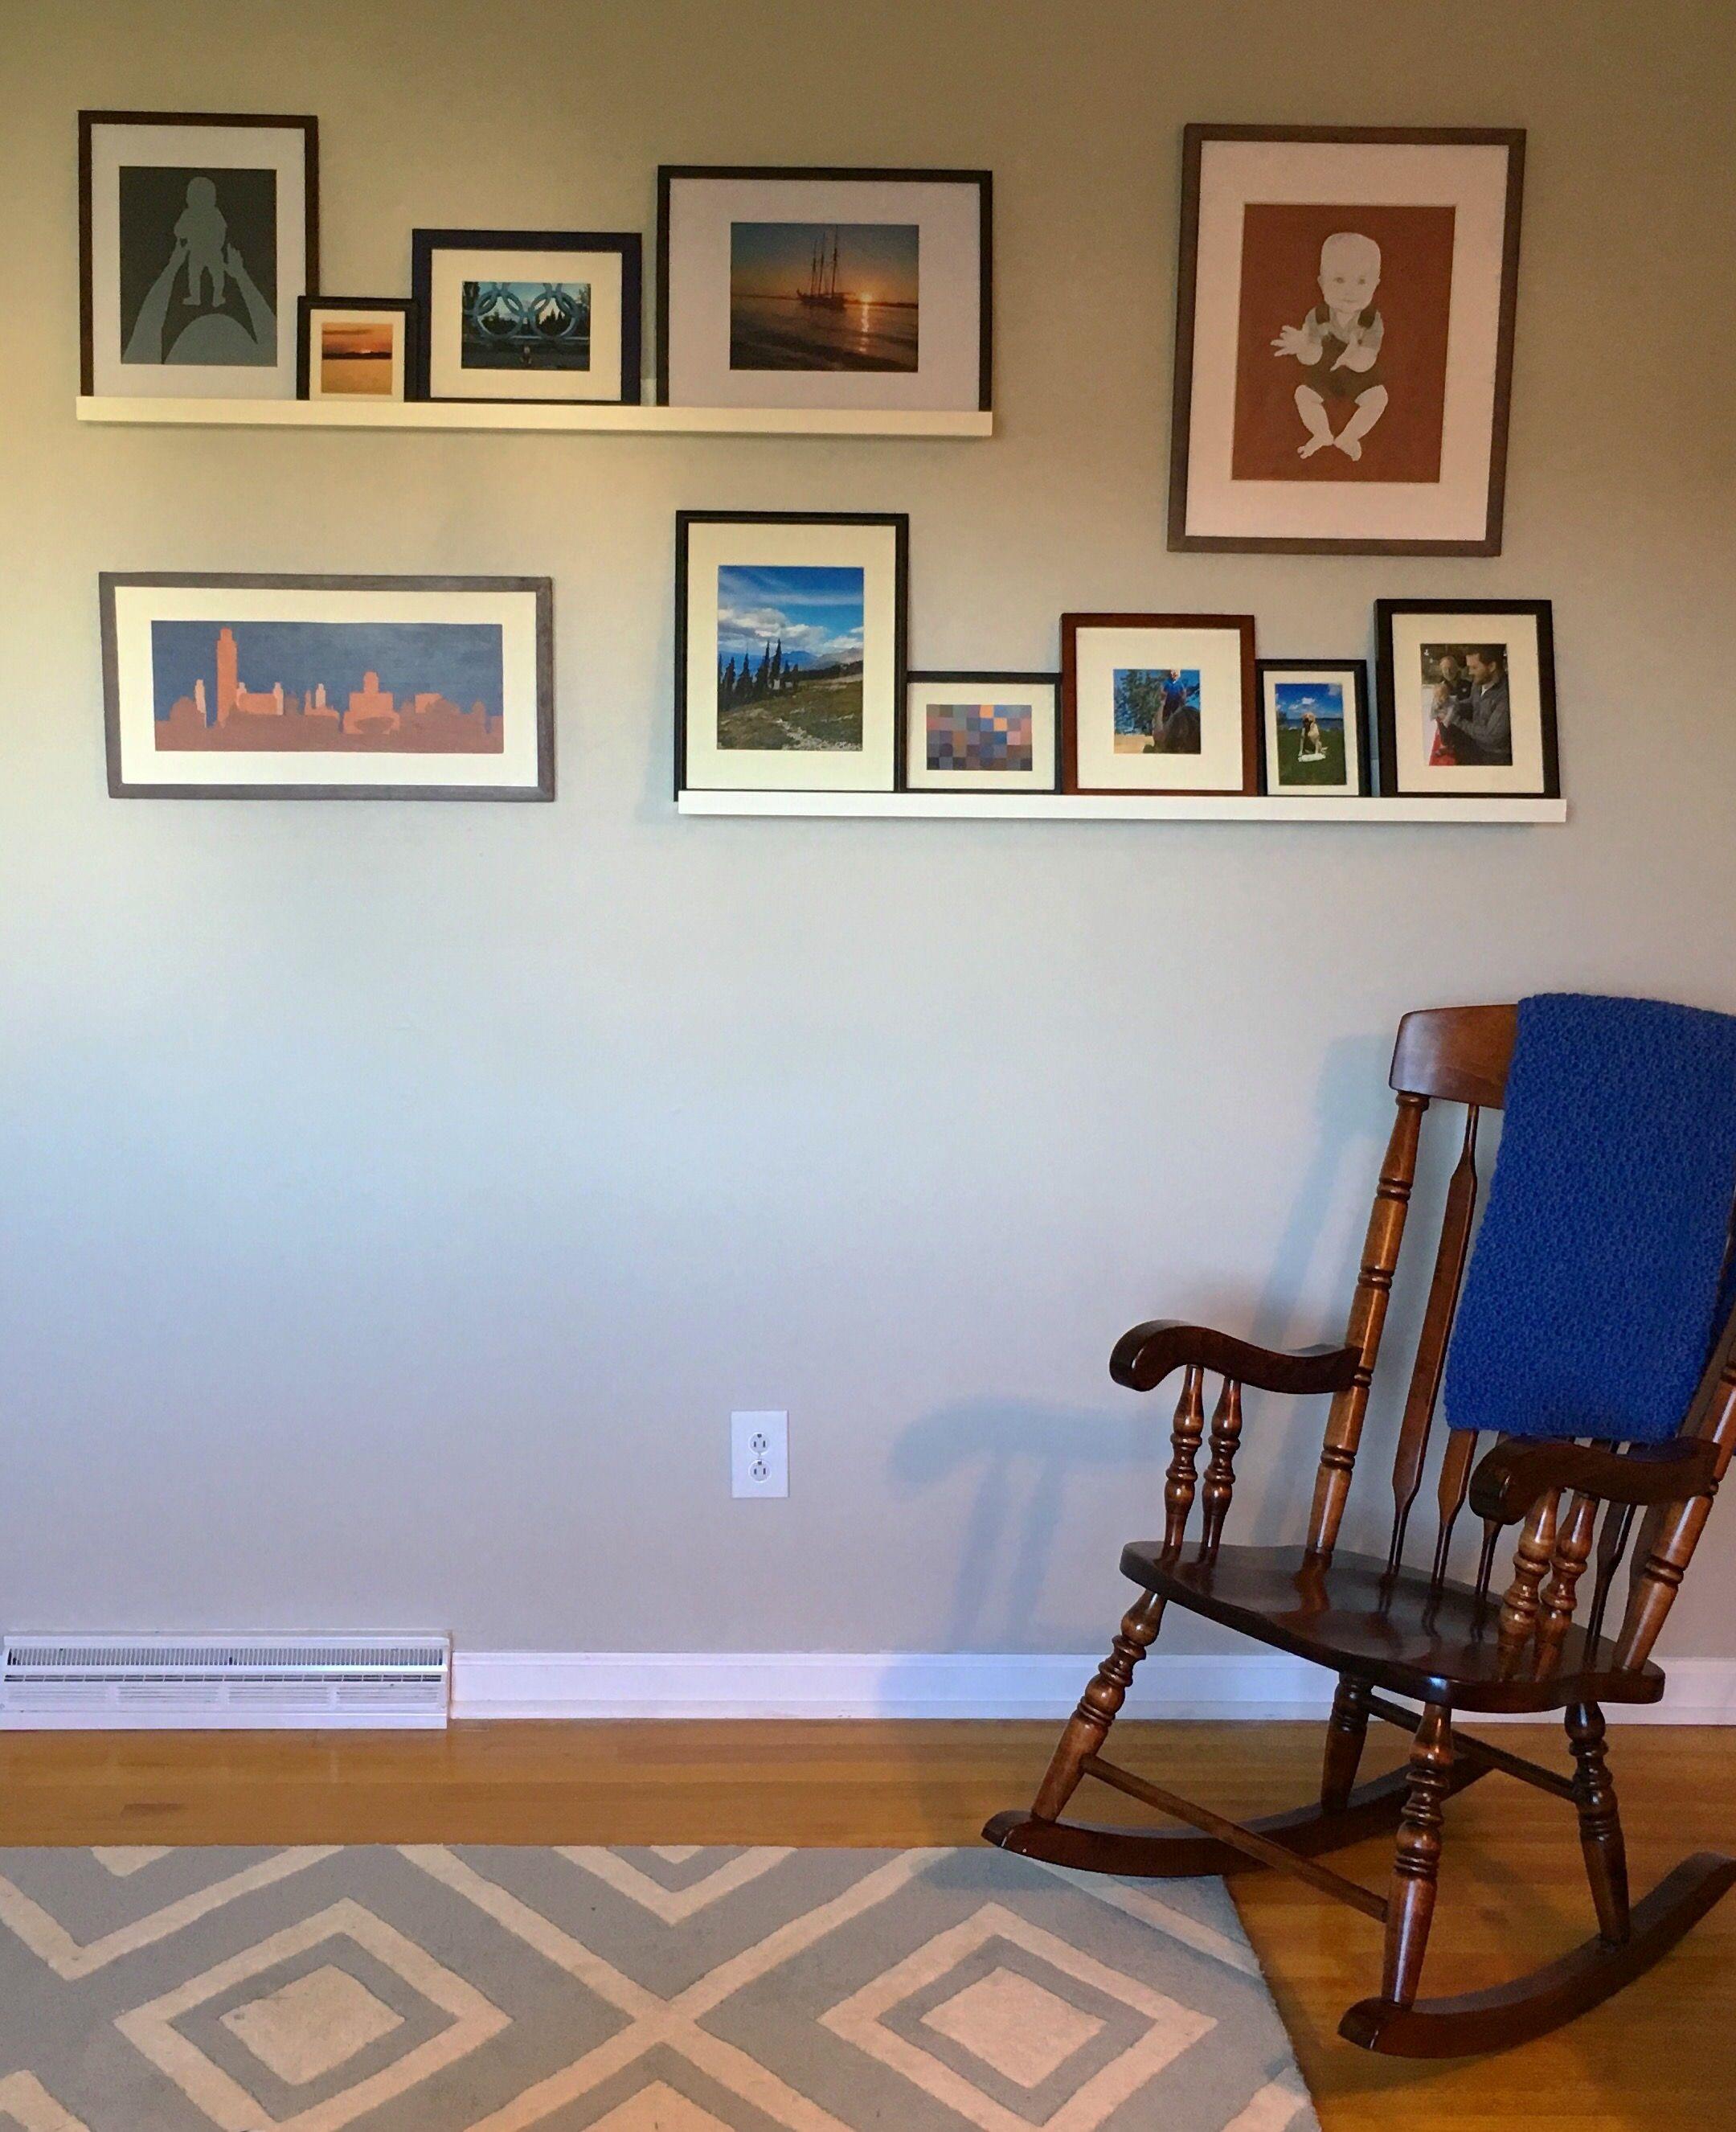 Living Room Ikea Mosslanda Photo Ledge